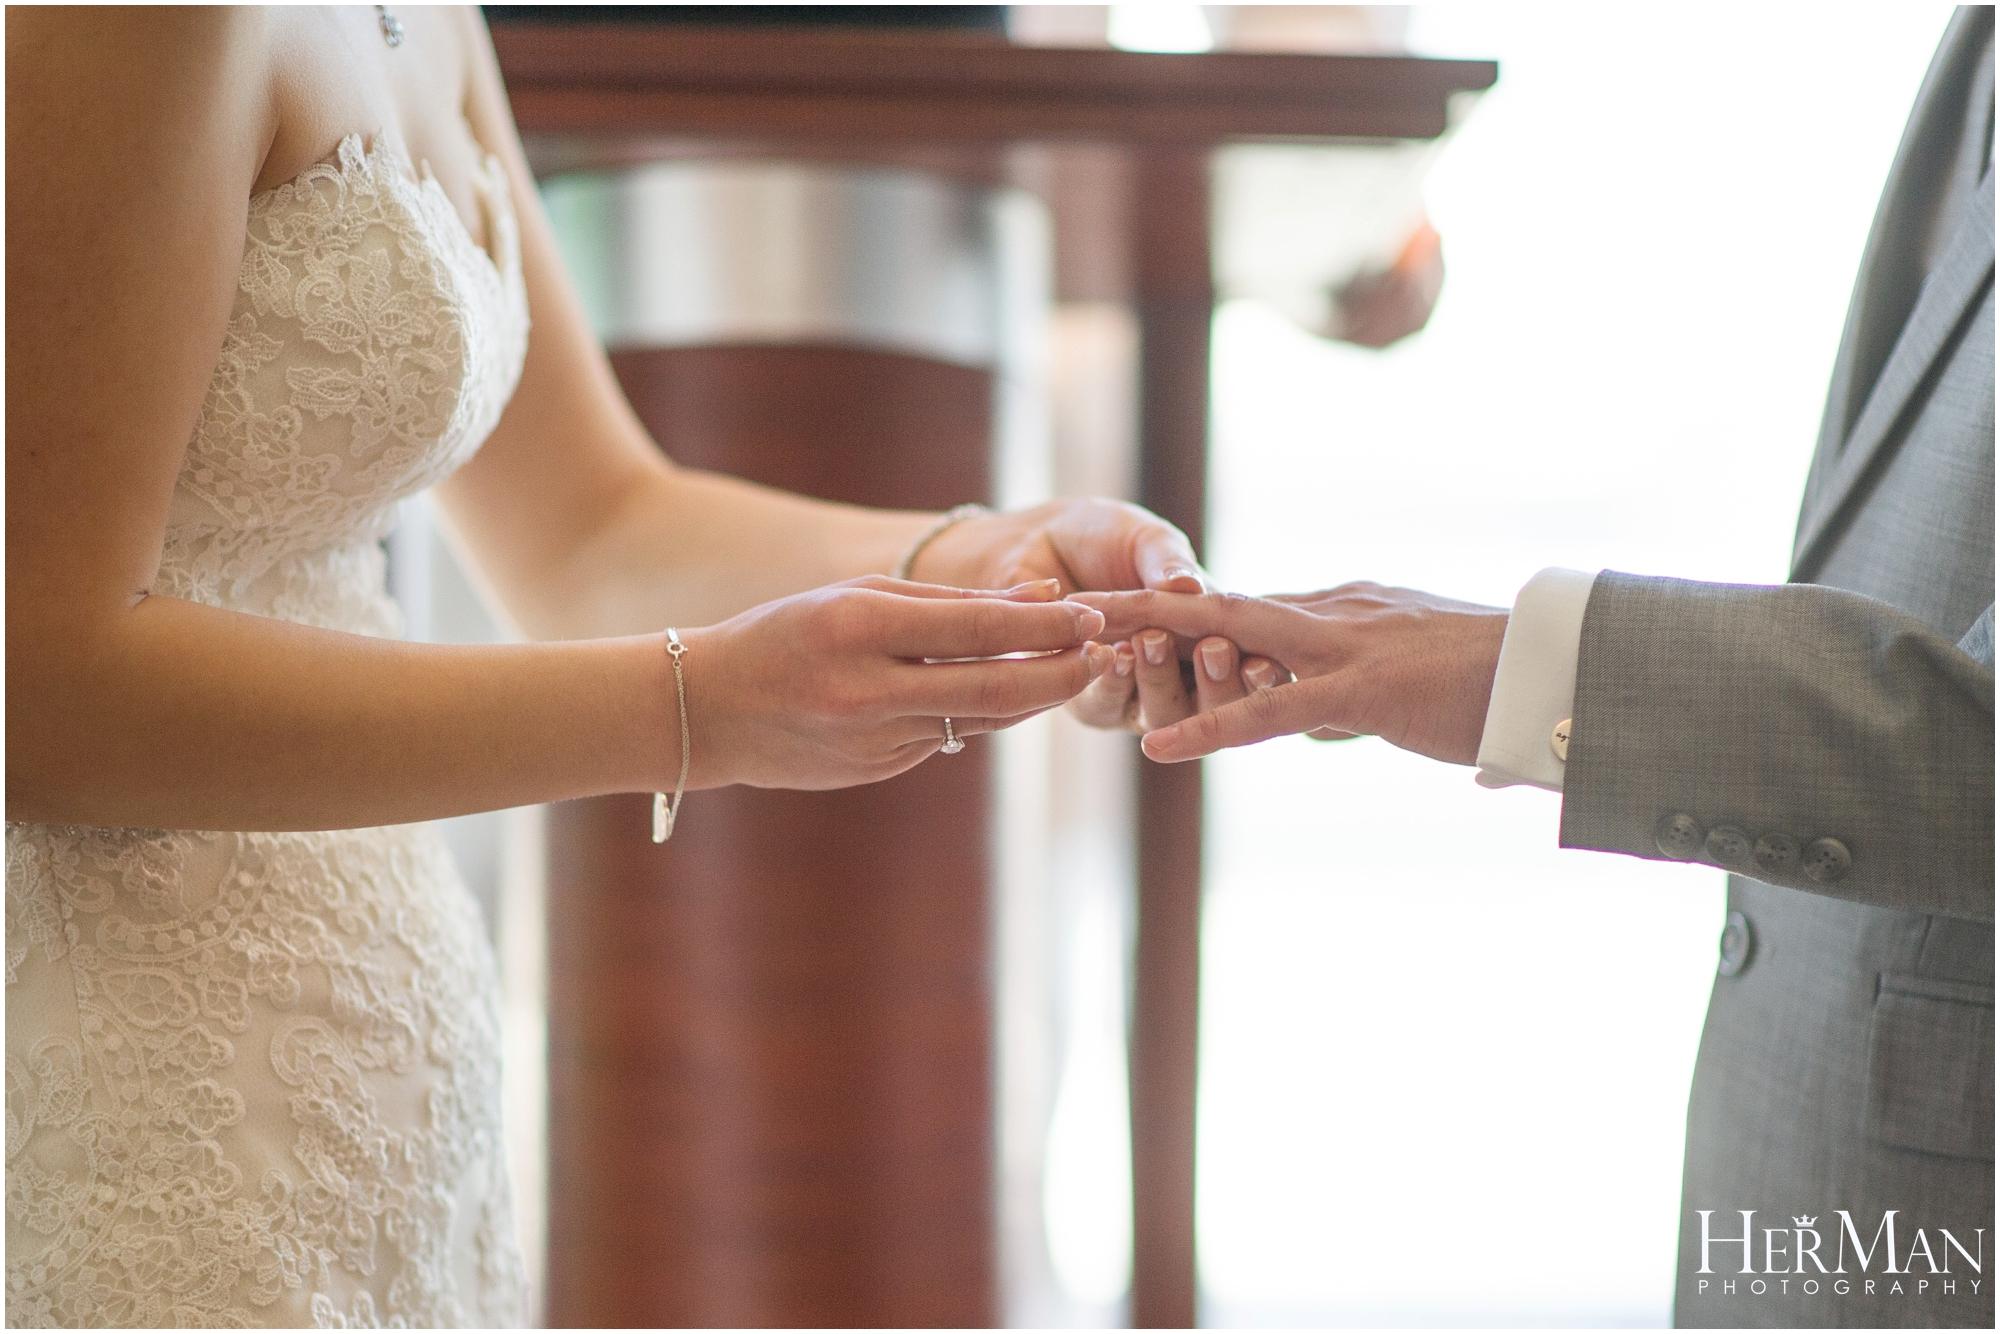 disney-fantasy-cruise-wedding-HerMan-photography_0029.jpg